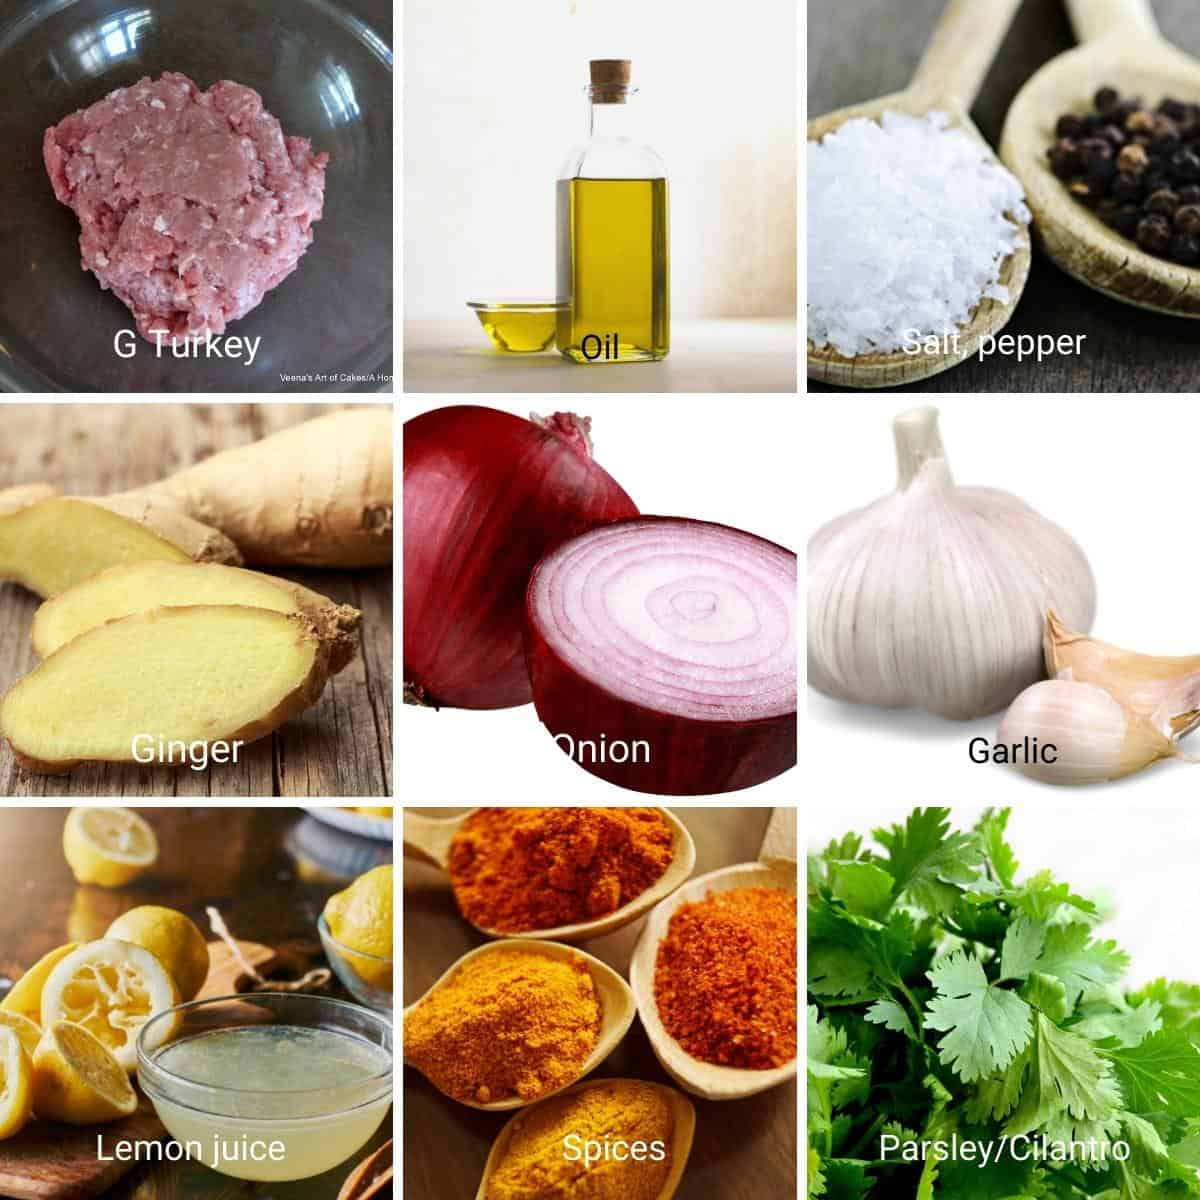 Ingredients shot collage for kebabs.